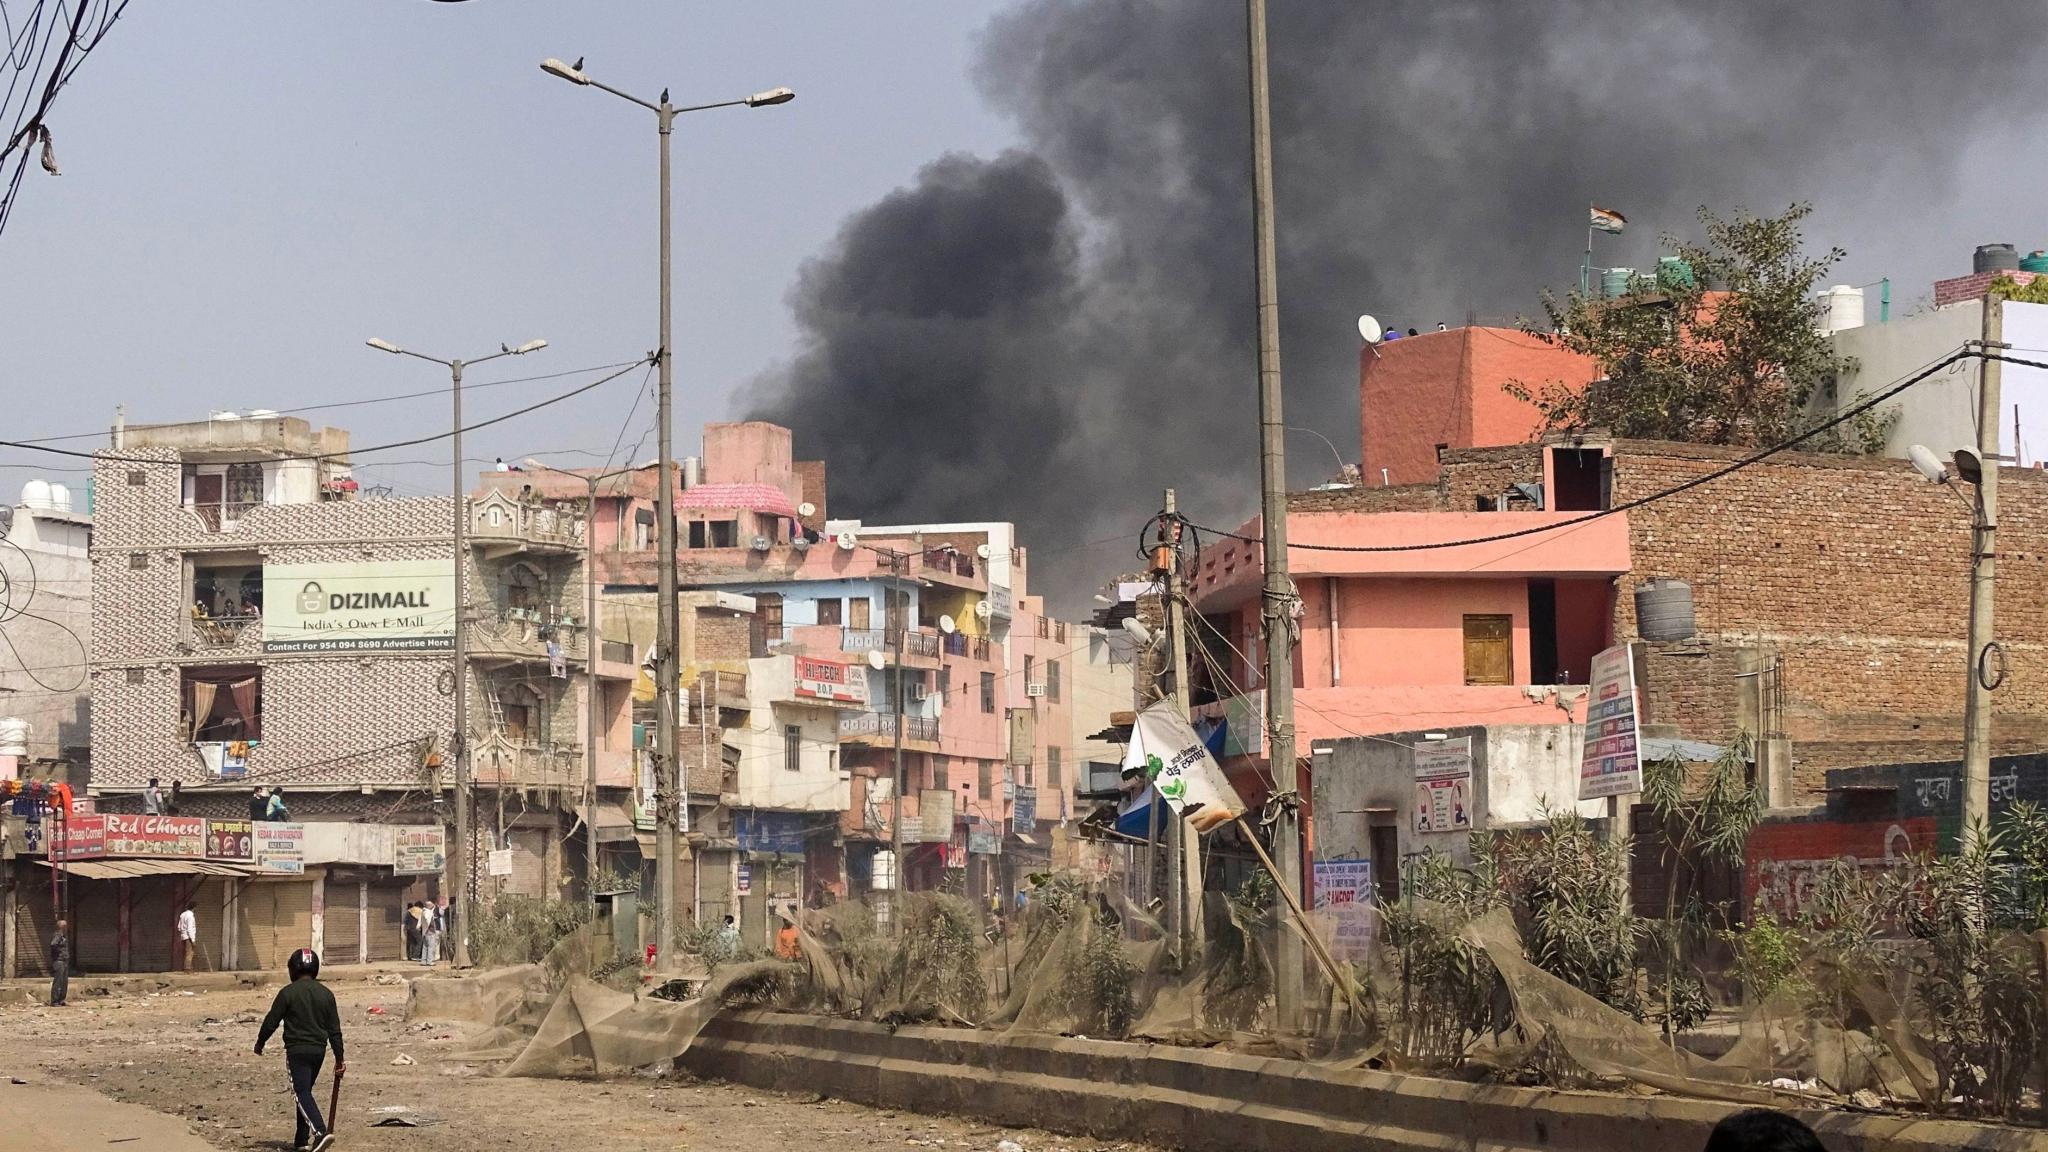 4 Journos Among People 'Beaten Up' Amid Violence in NE Delhi